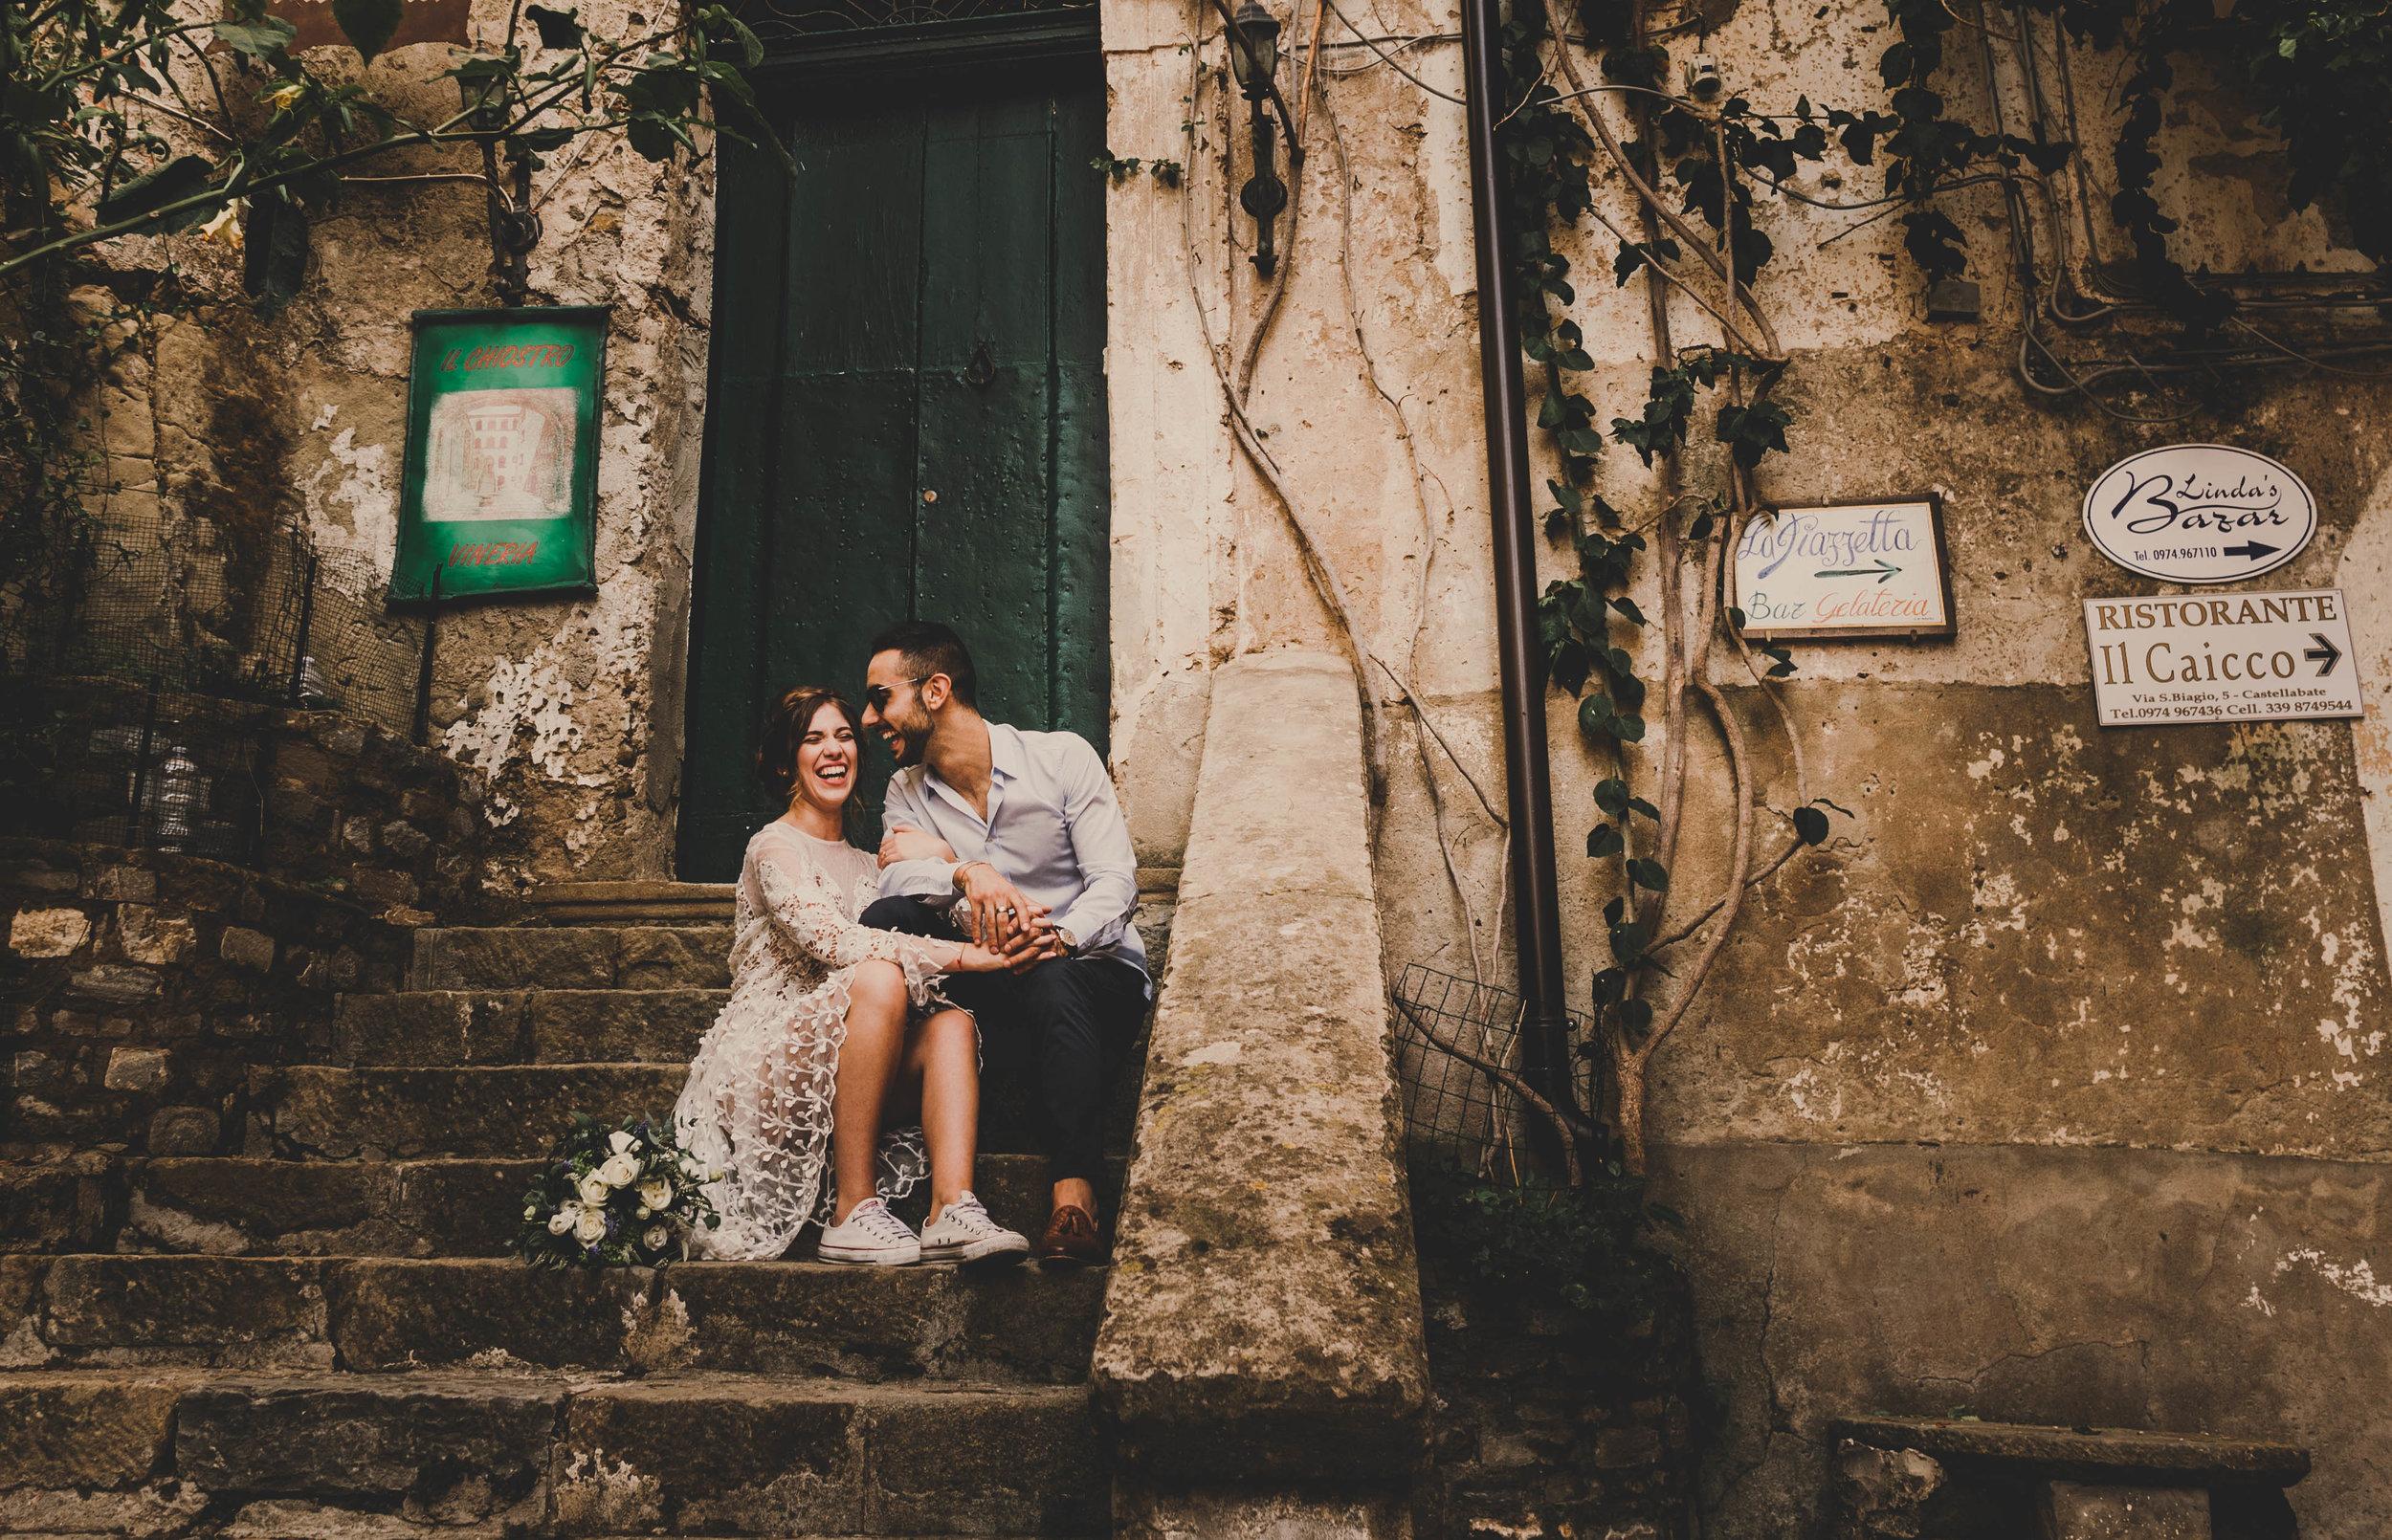 Italy-wedding-photography (9).jpg